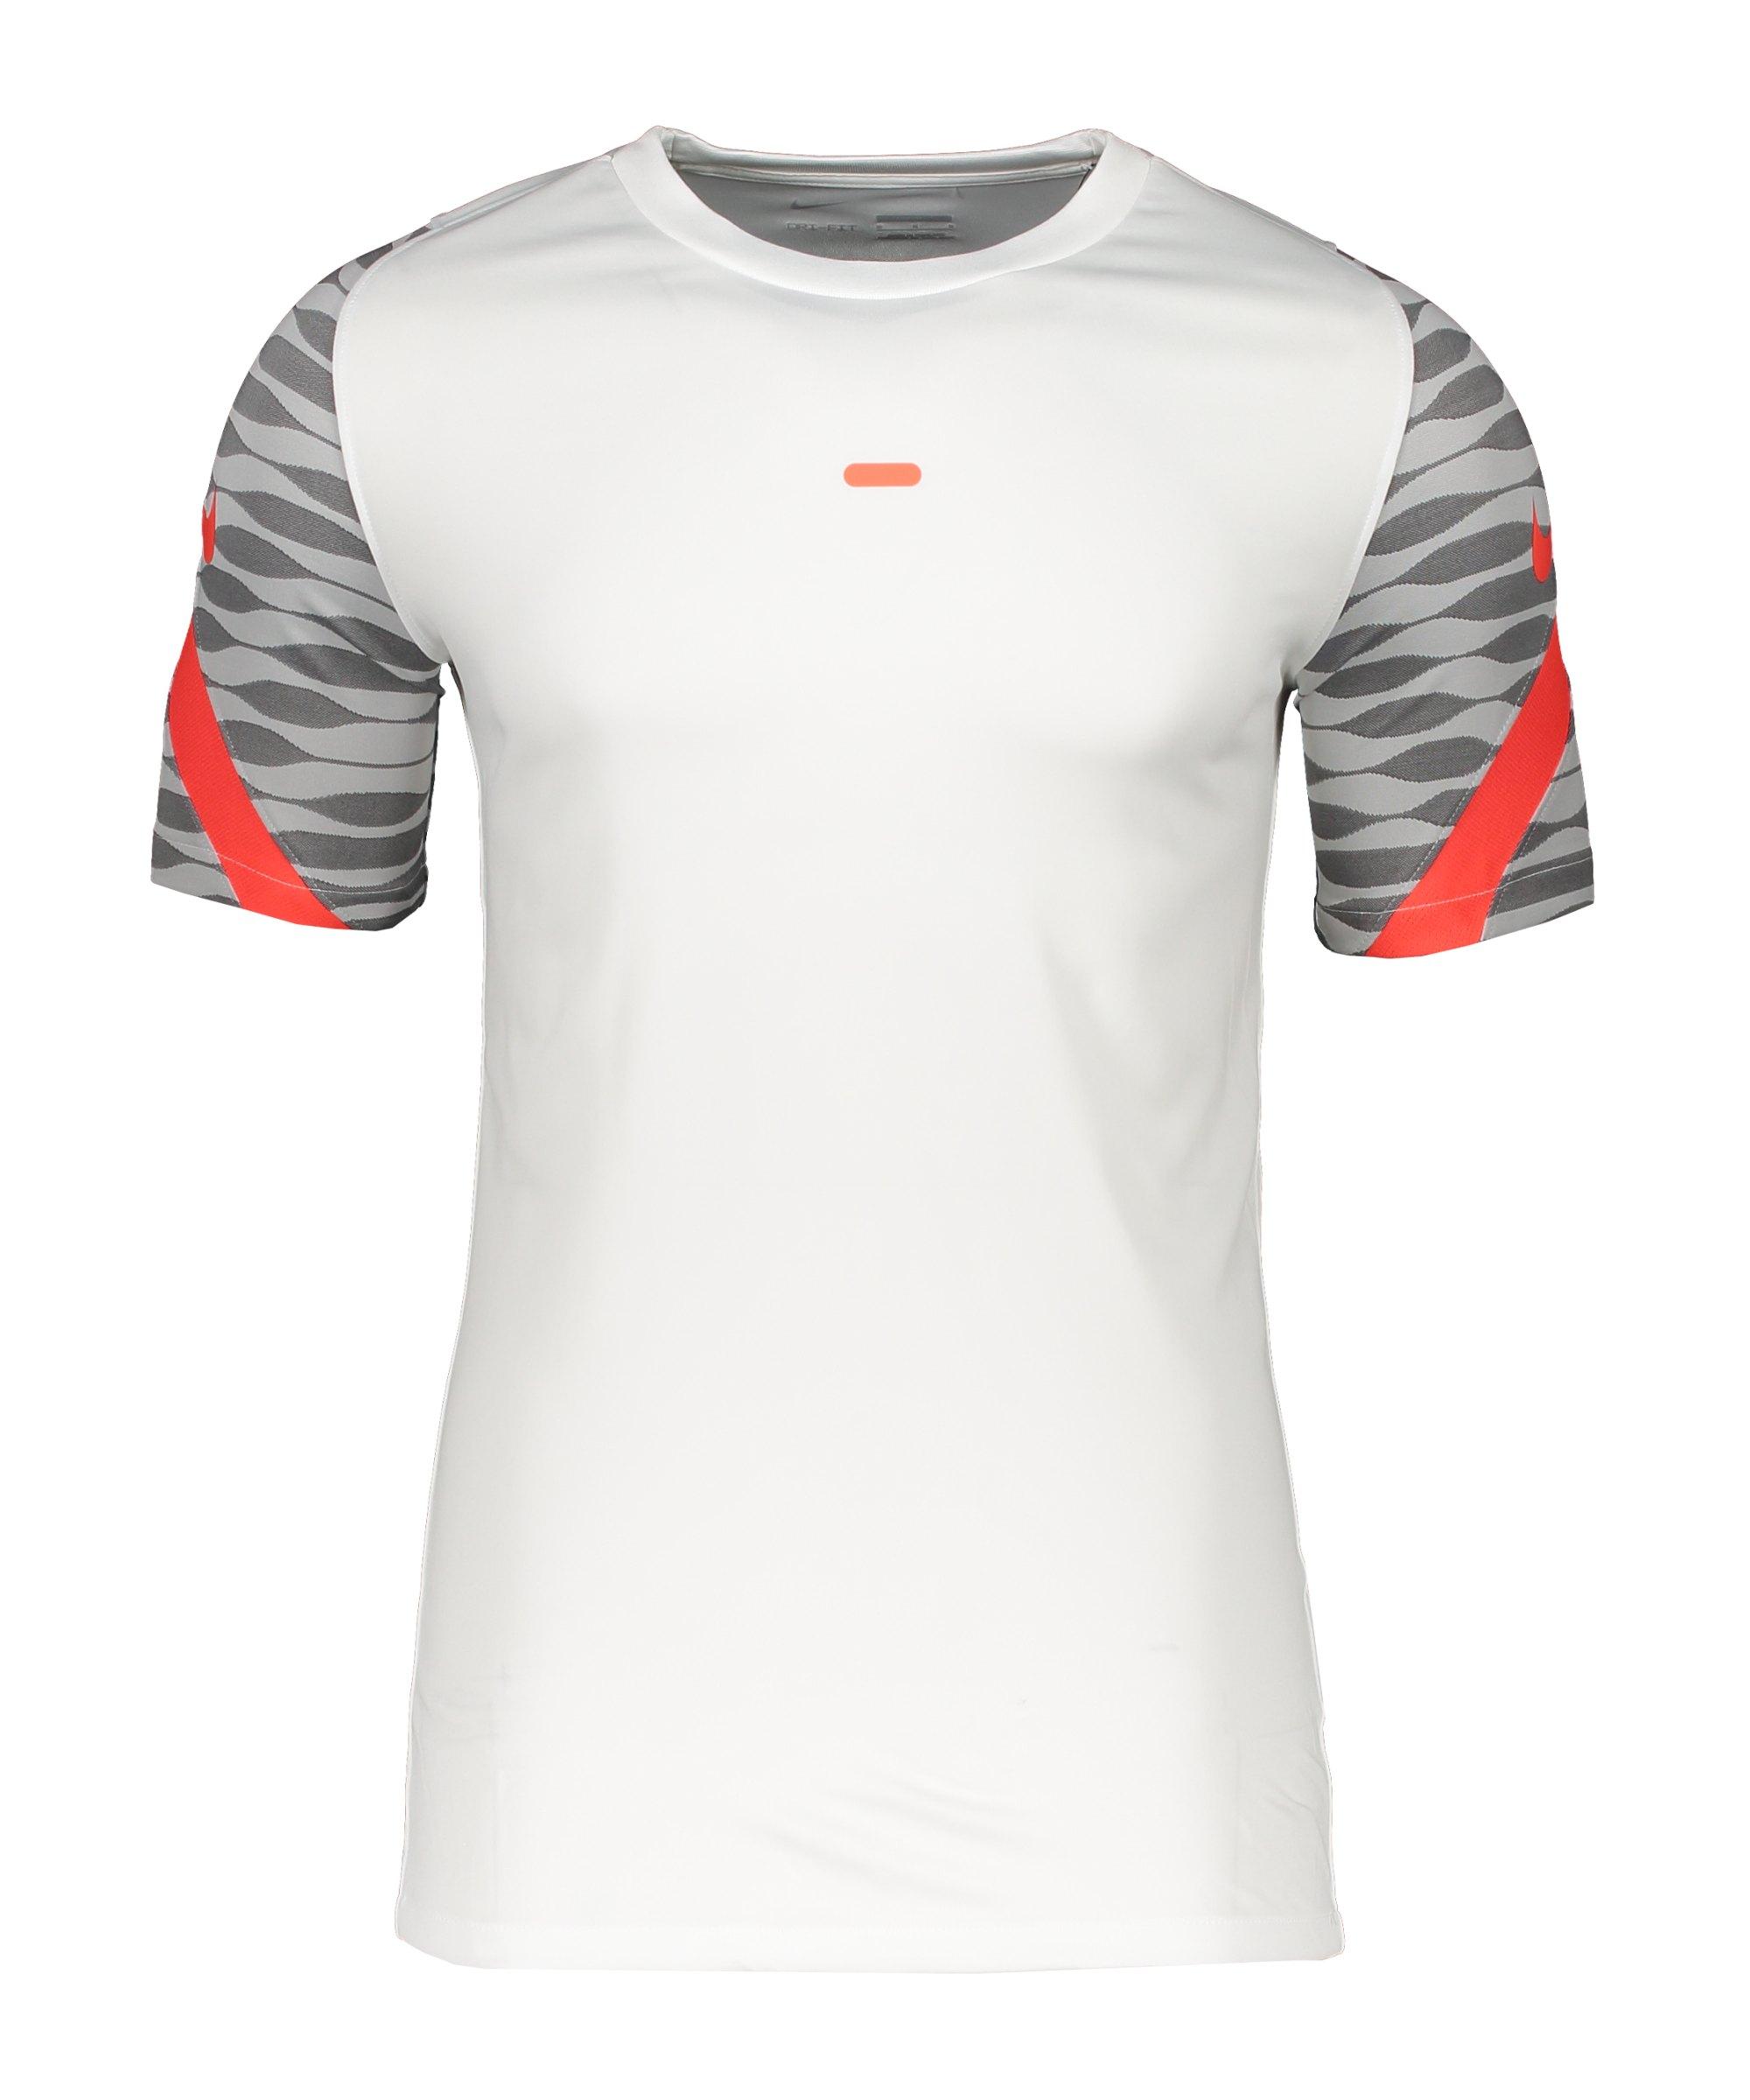 Nike Strike 21 T-Shirt Weiss Schwarz F101 - weiss